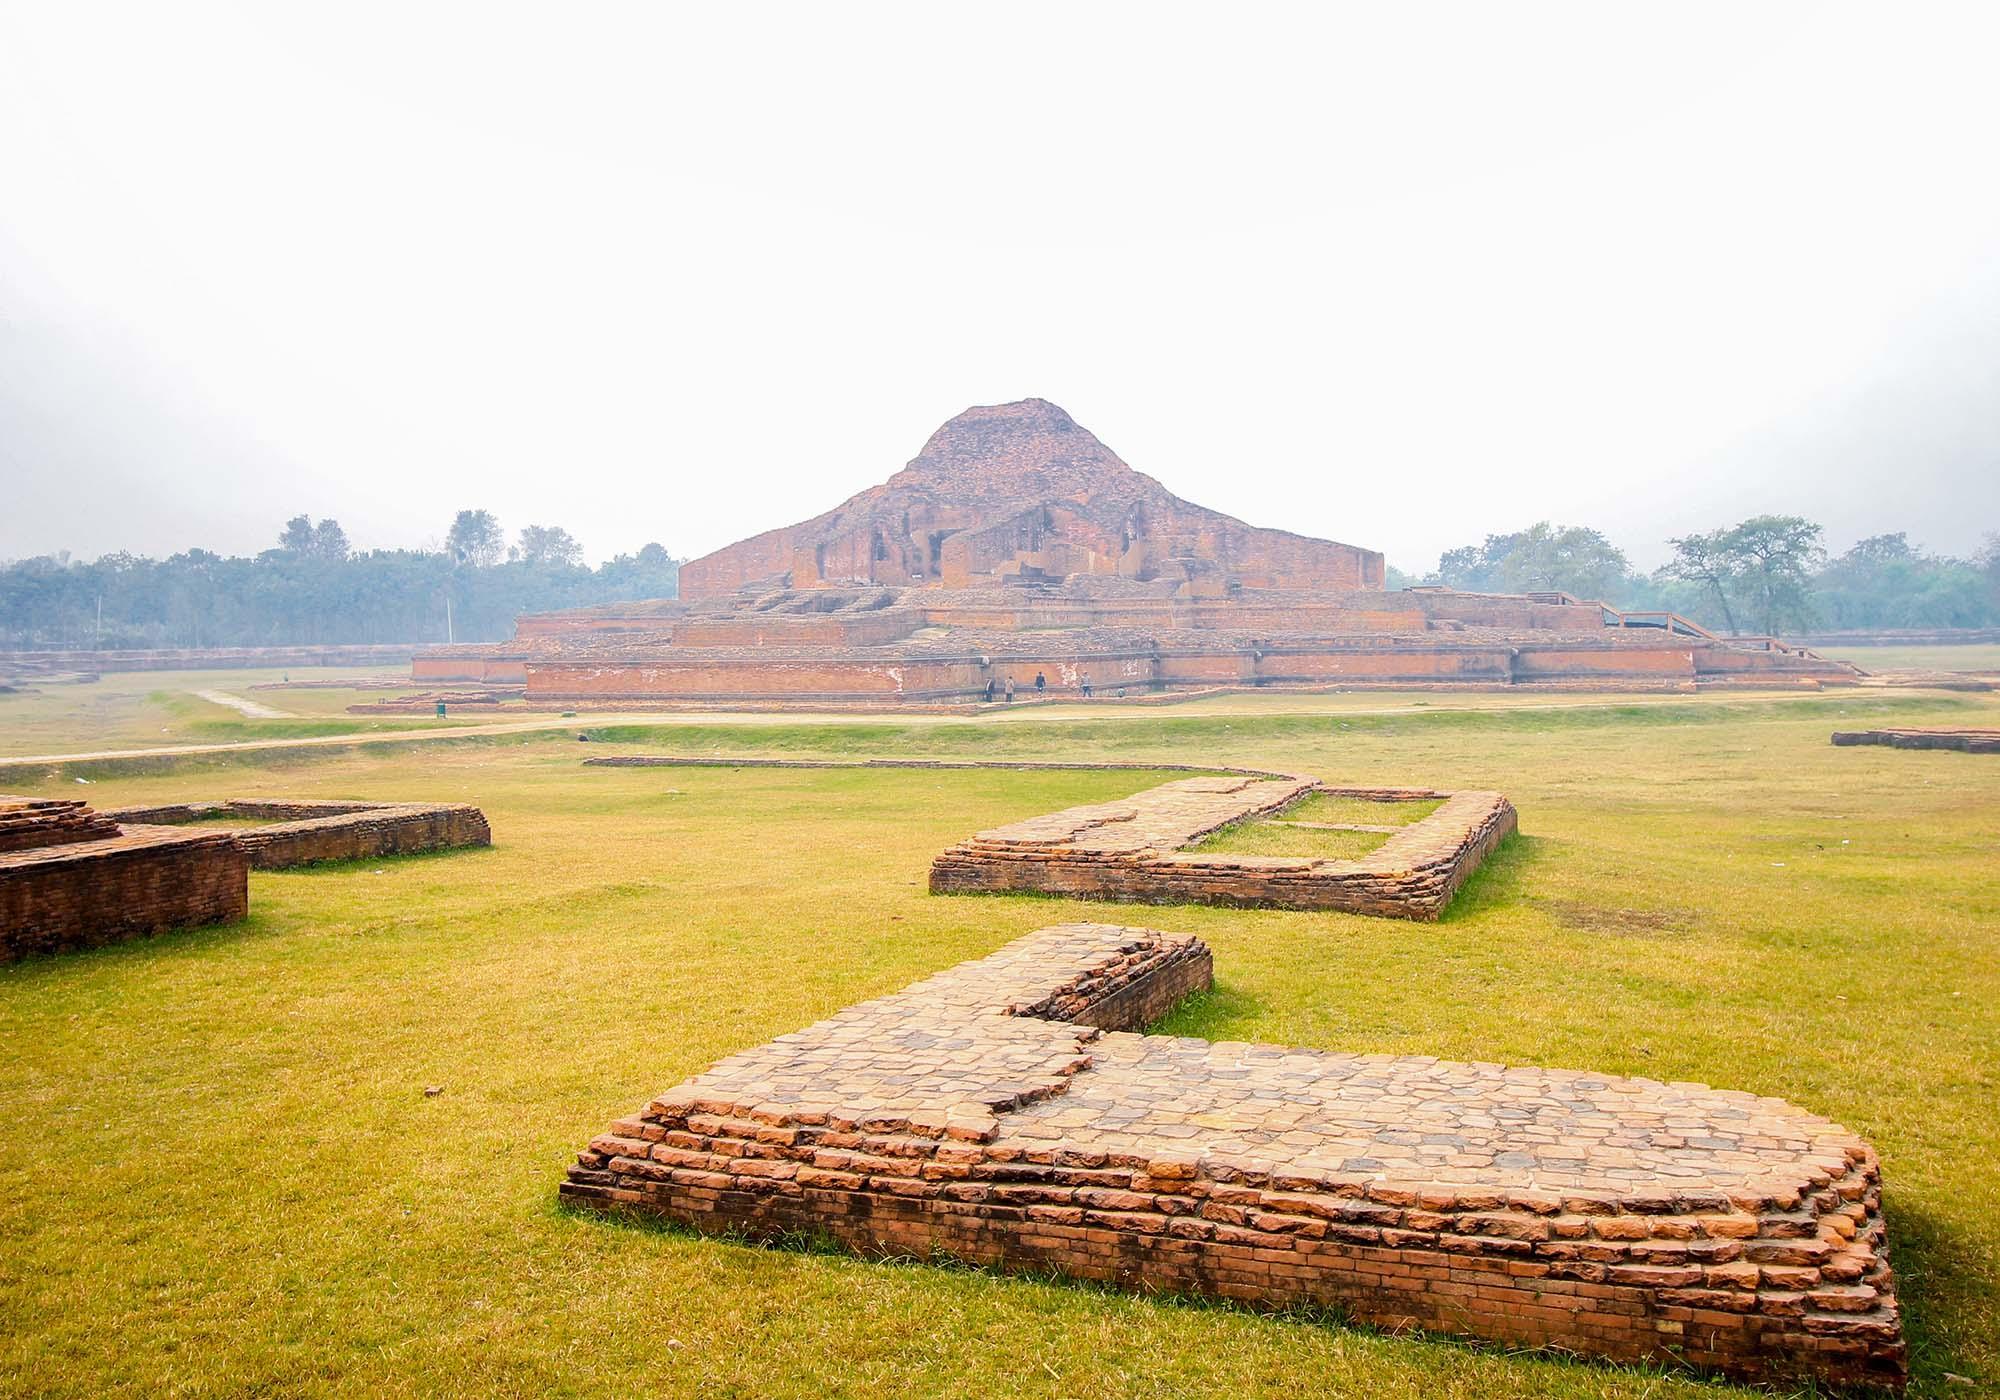 Looking across Paharpur to the central temple of the Somapura Mahavihara monastery. – © Roni Kabir Nurul